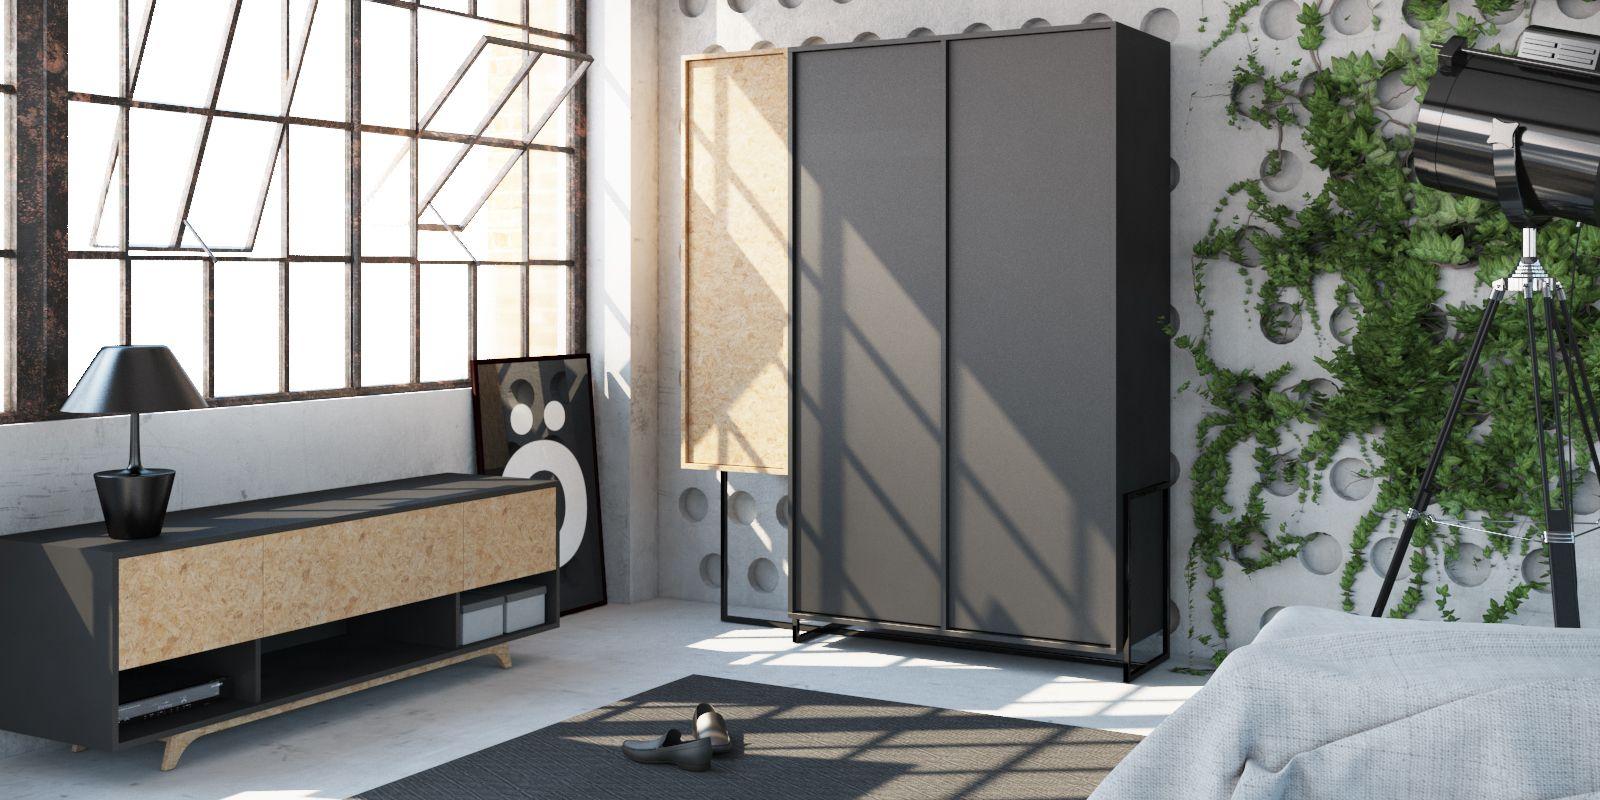 Wardrobe 3-door AA058 KROOD STEEL